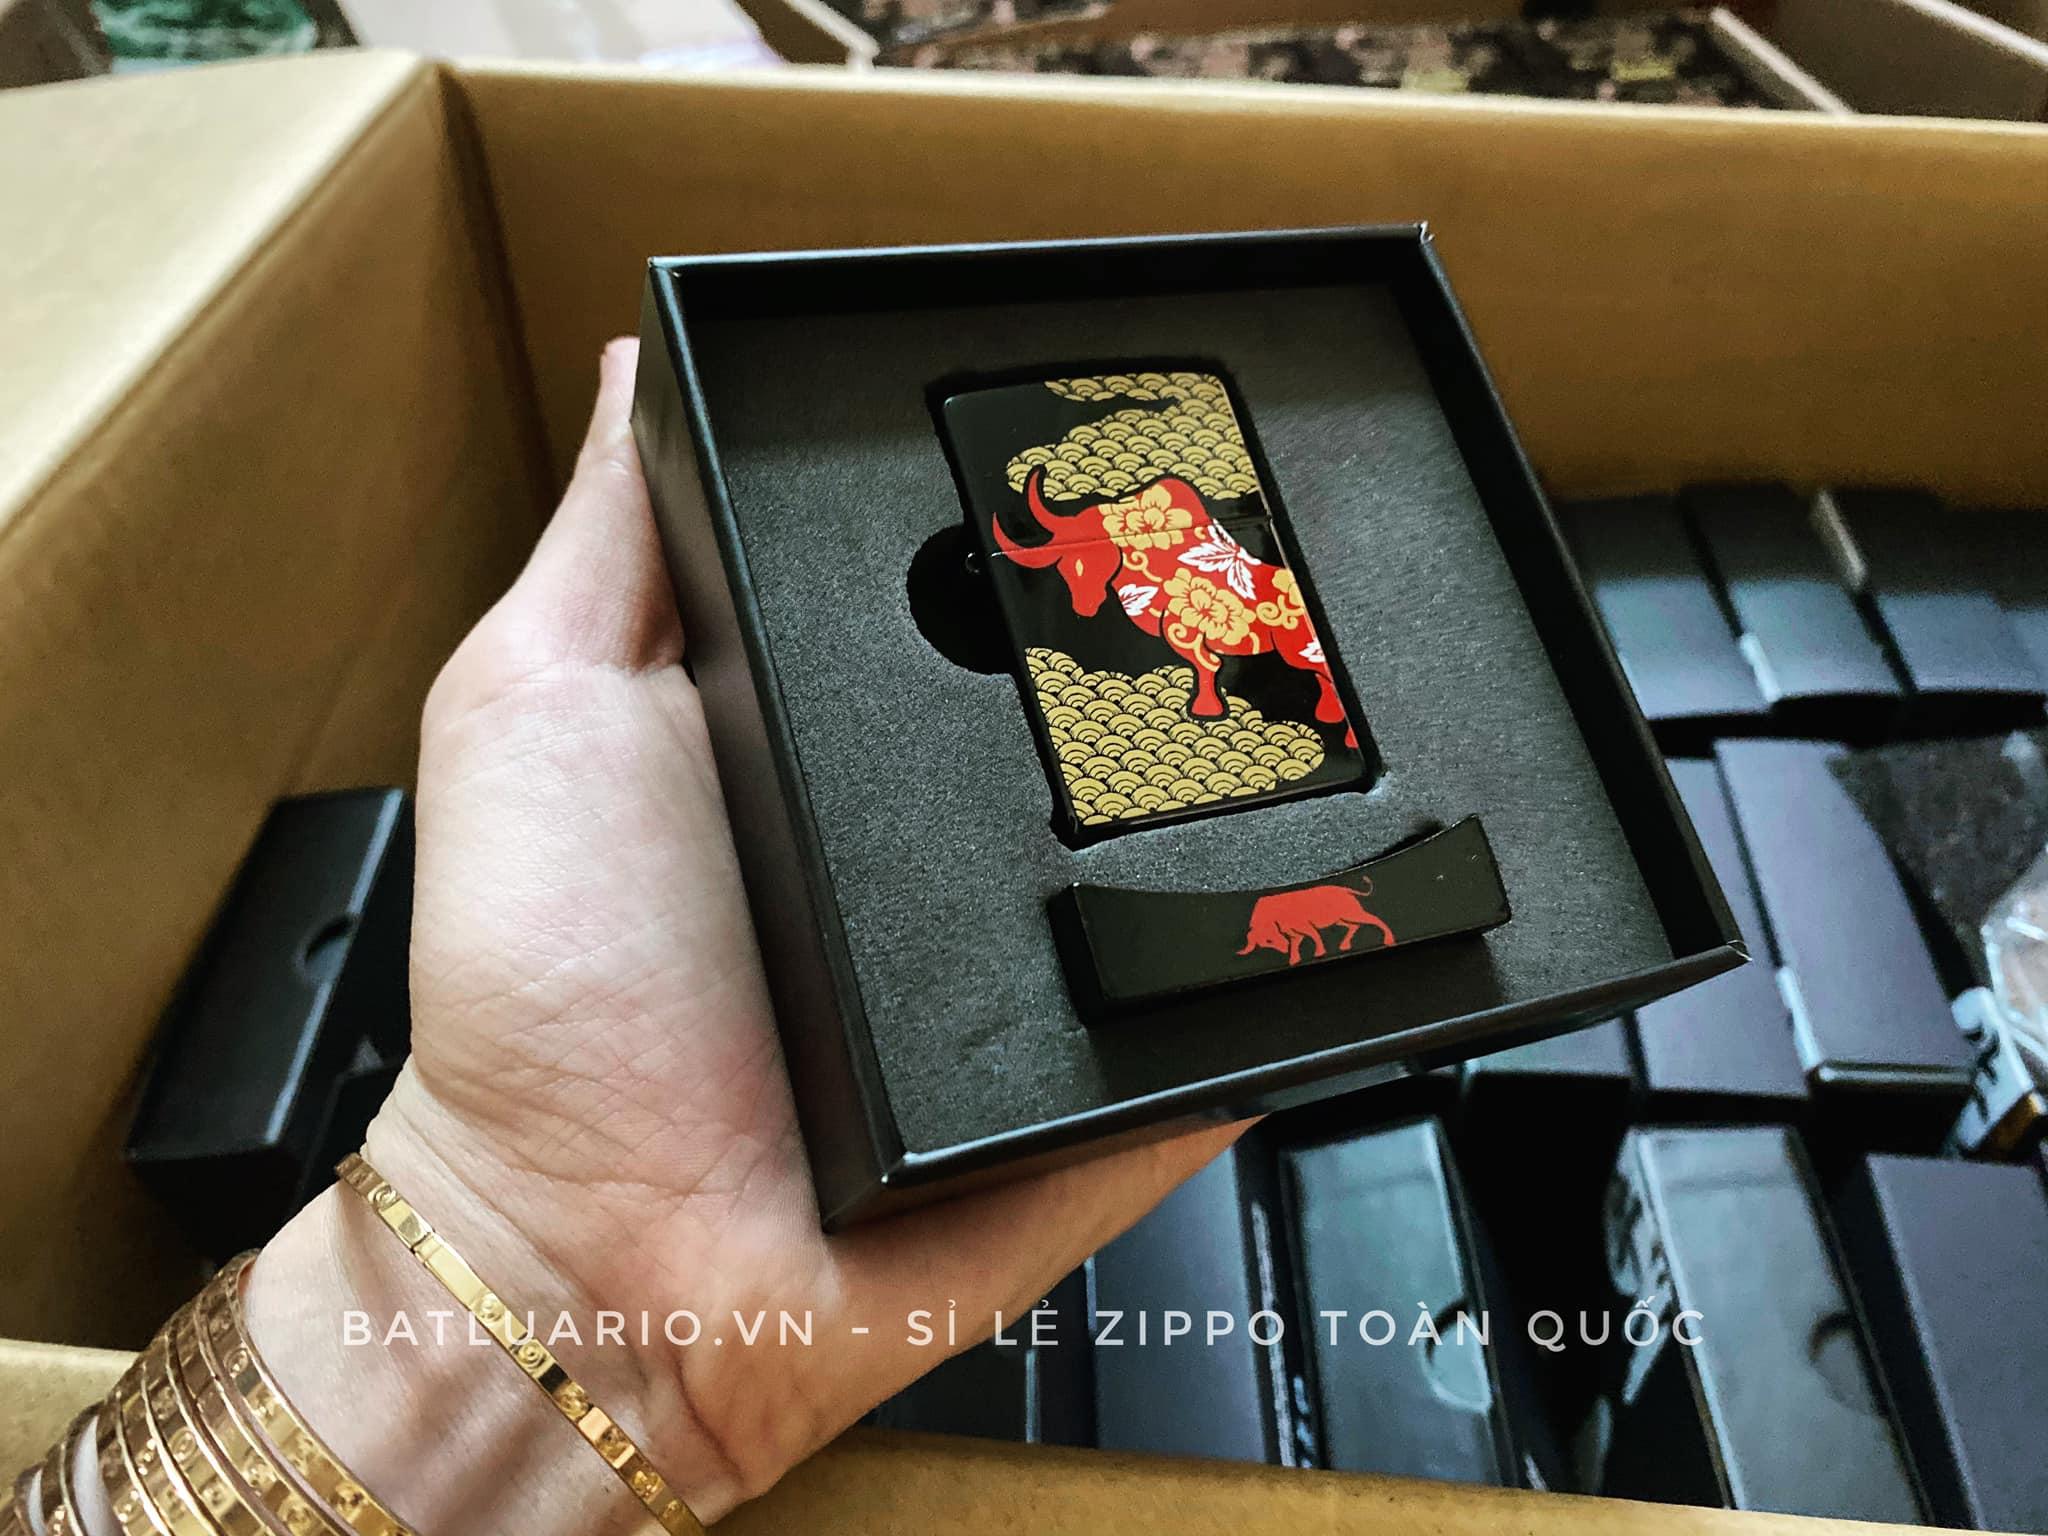 Zippo Year Of The Ox Black Asia Limited Edition - Zippo CZA-2-18B 7